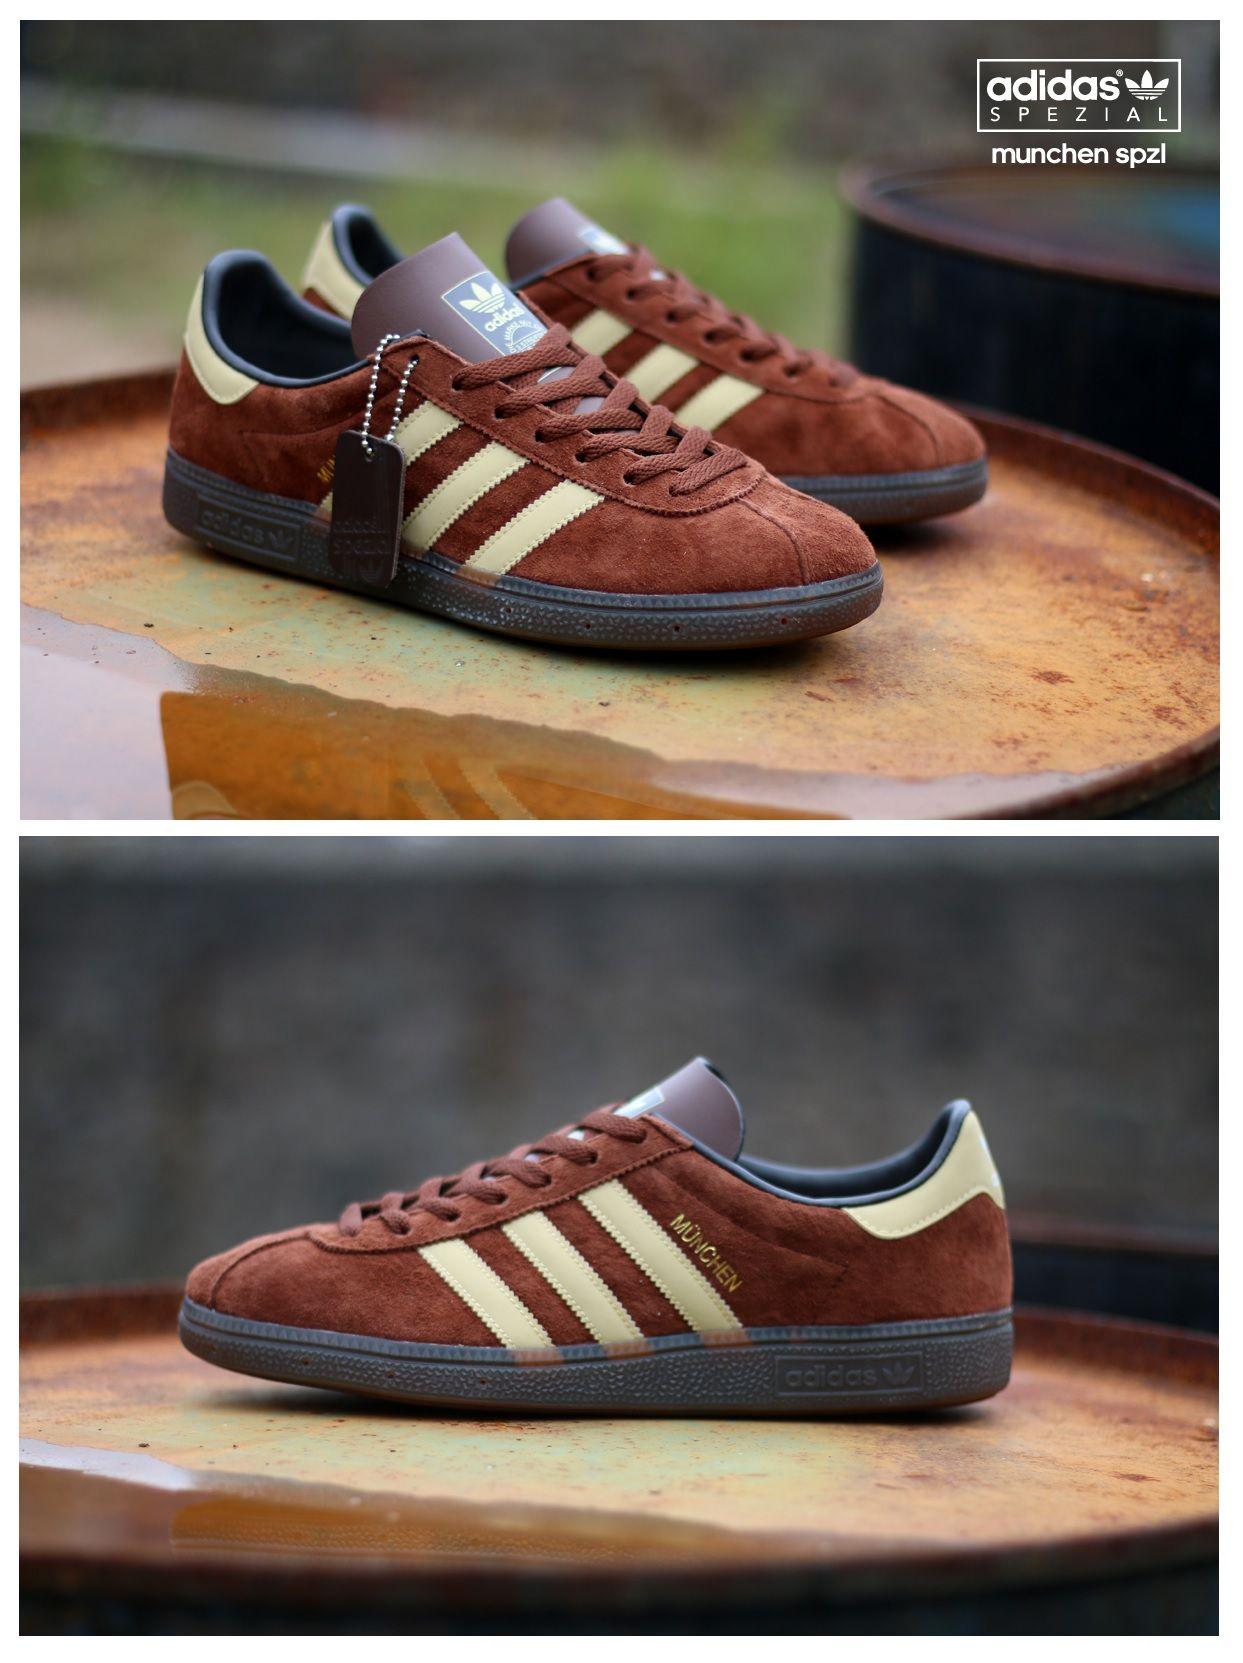 München Originals Adidas Munchen Spzl Pinterest Sneakers qw8x8FI